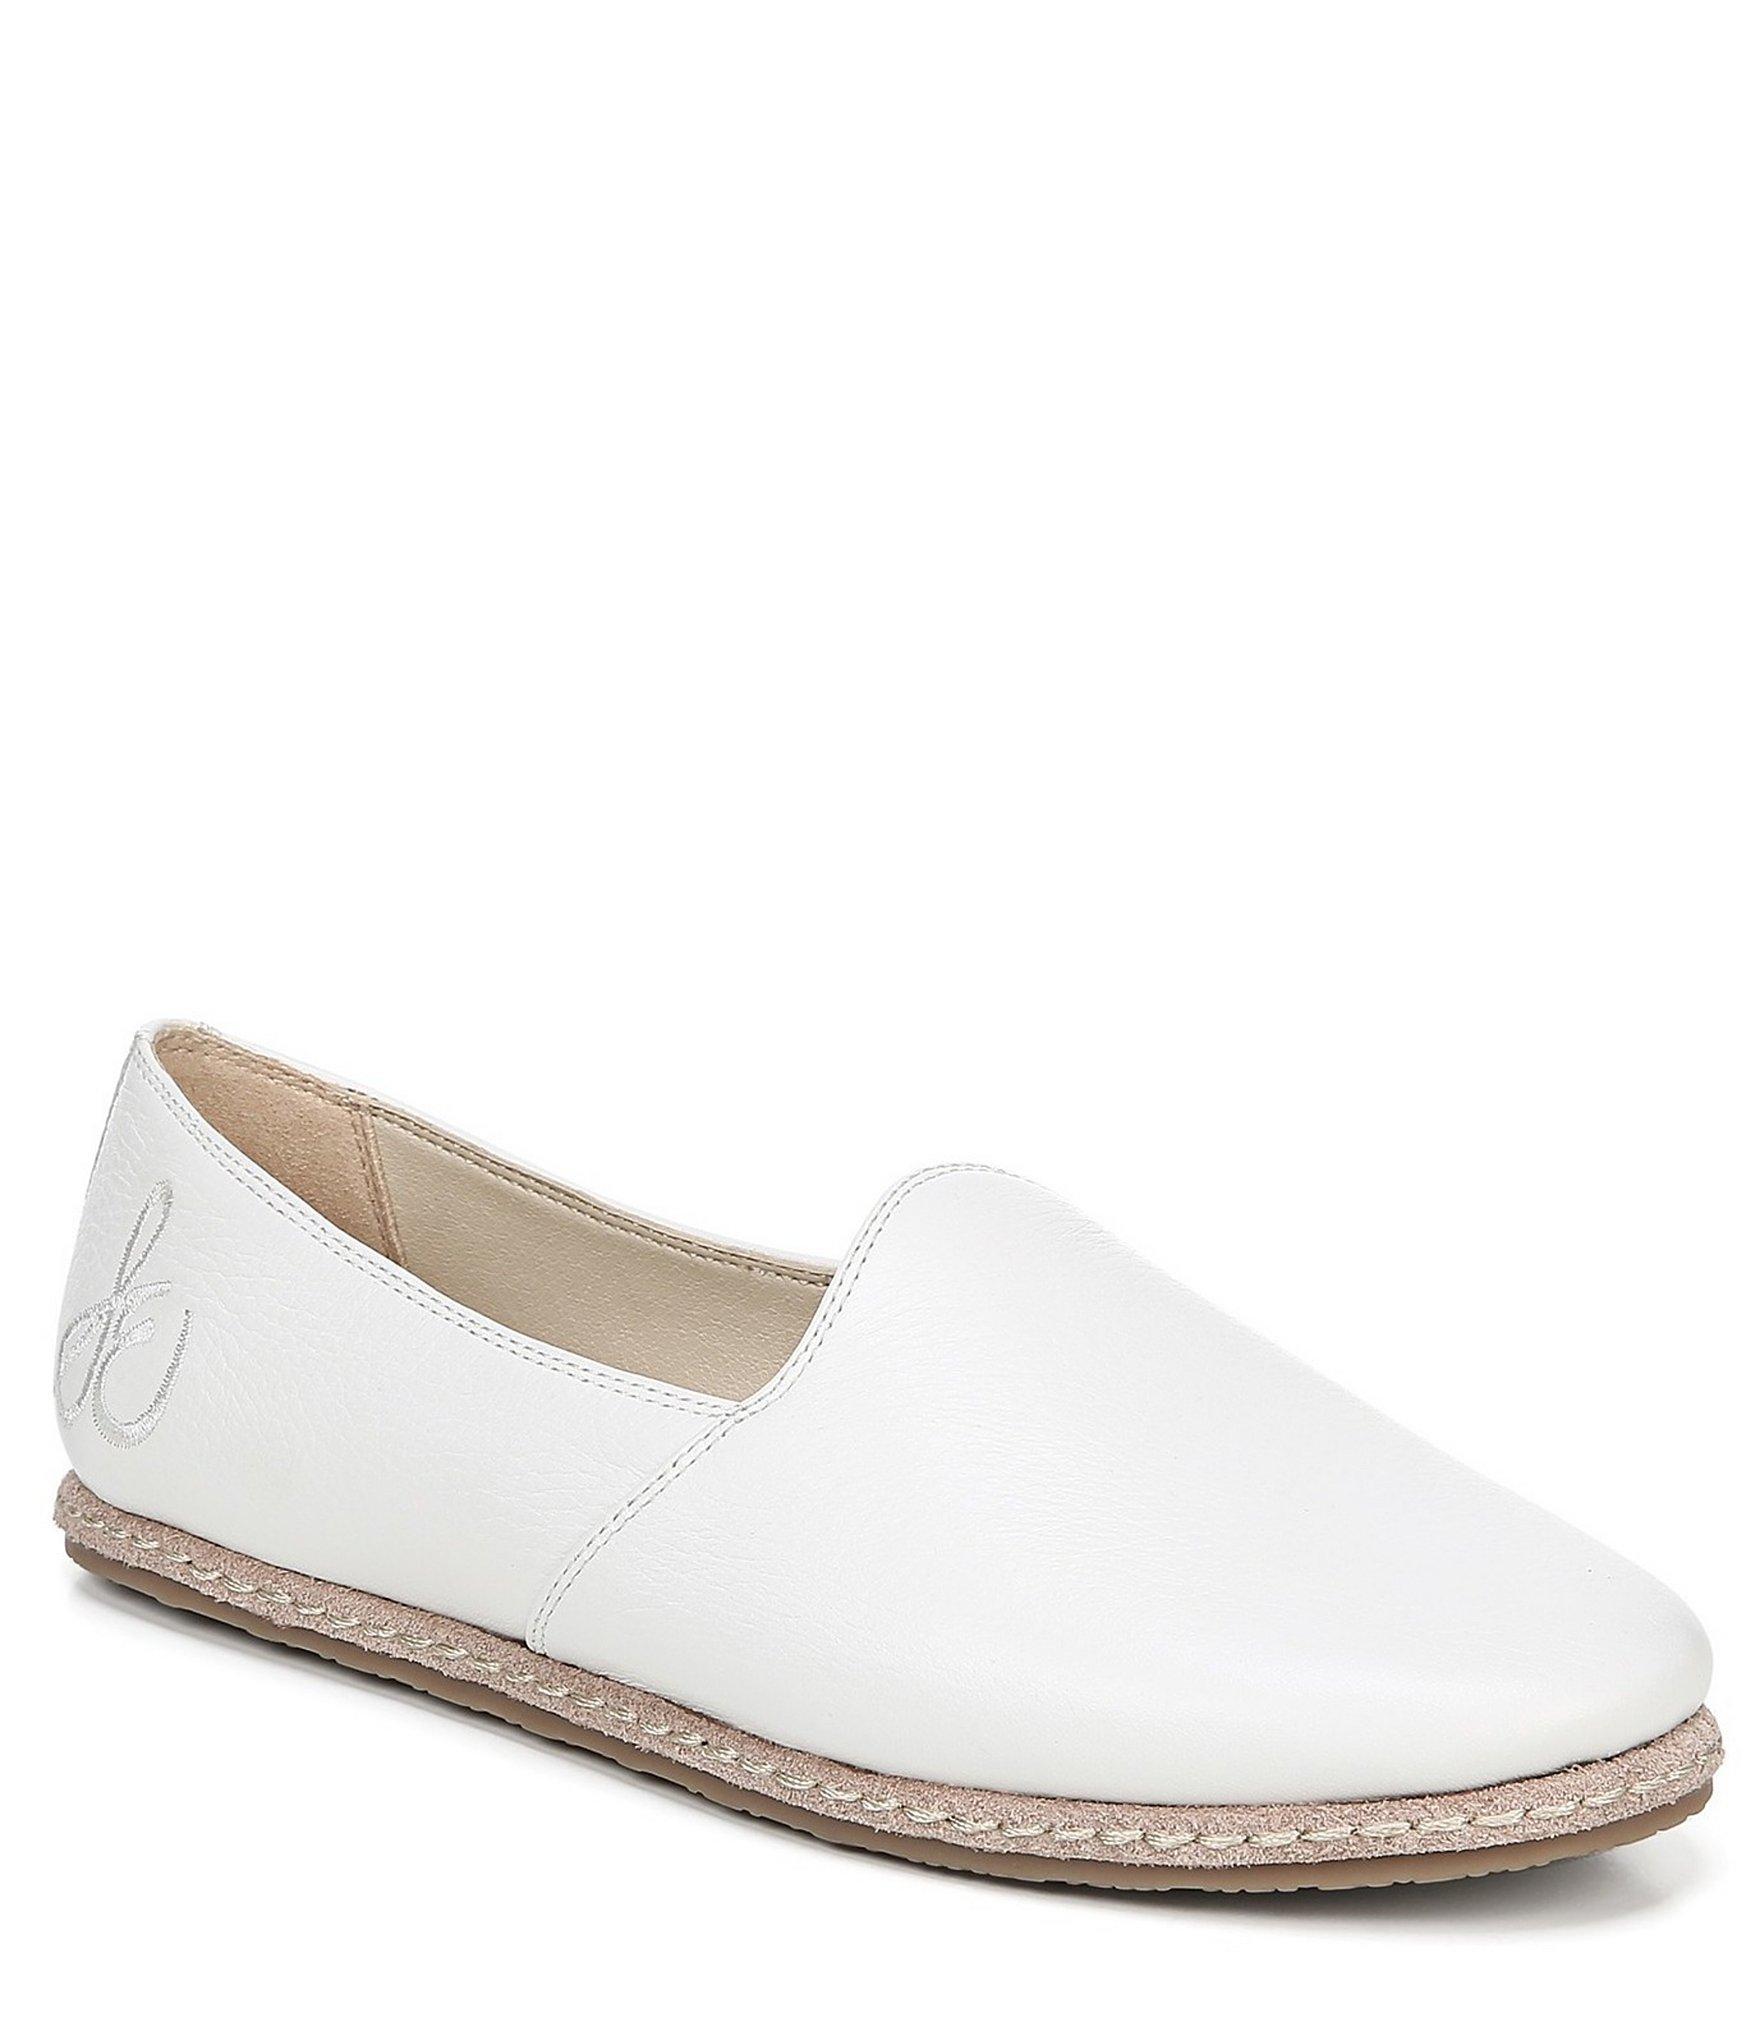 bb6d1c81d85 Lyst - Sam Edelman Everie Leather Slip Ons in White